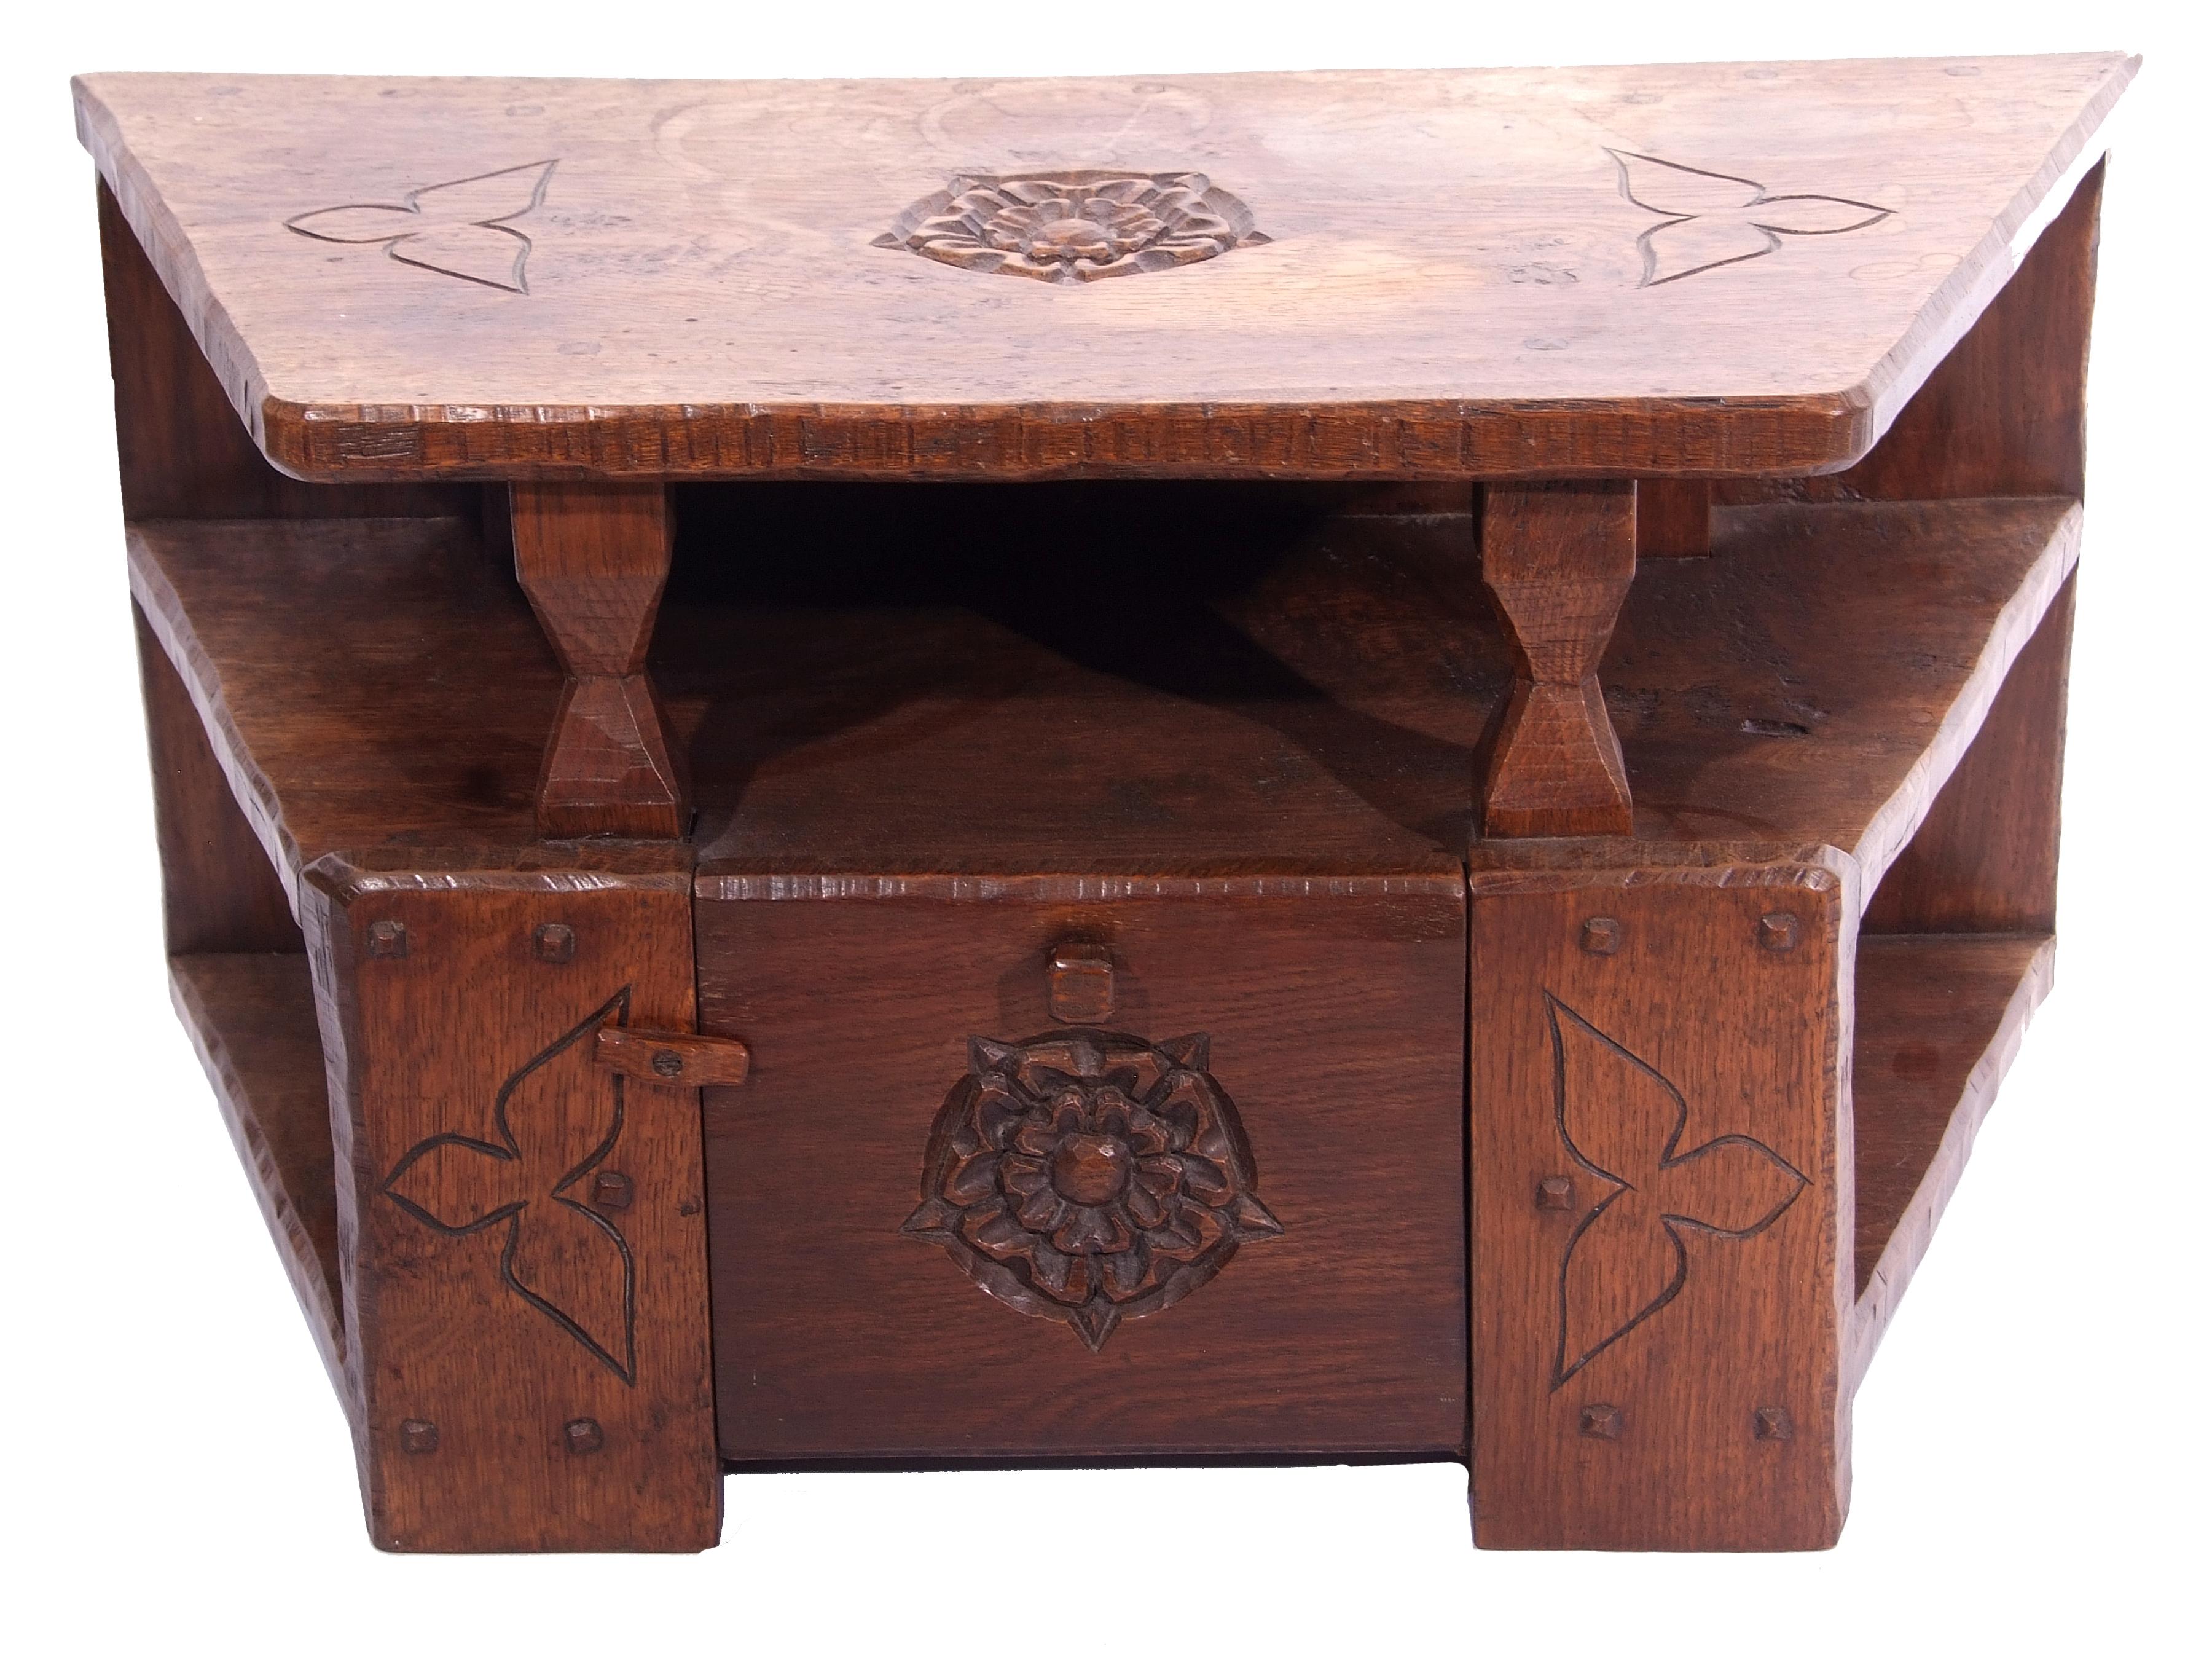 Jack Grimble of Cromer, a small oak losenge shaped side table with carved Tudor Rose detail 76cm